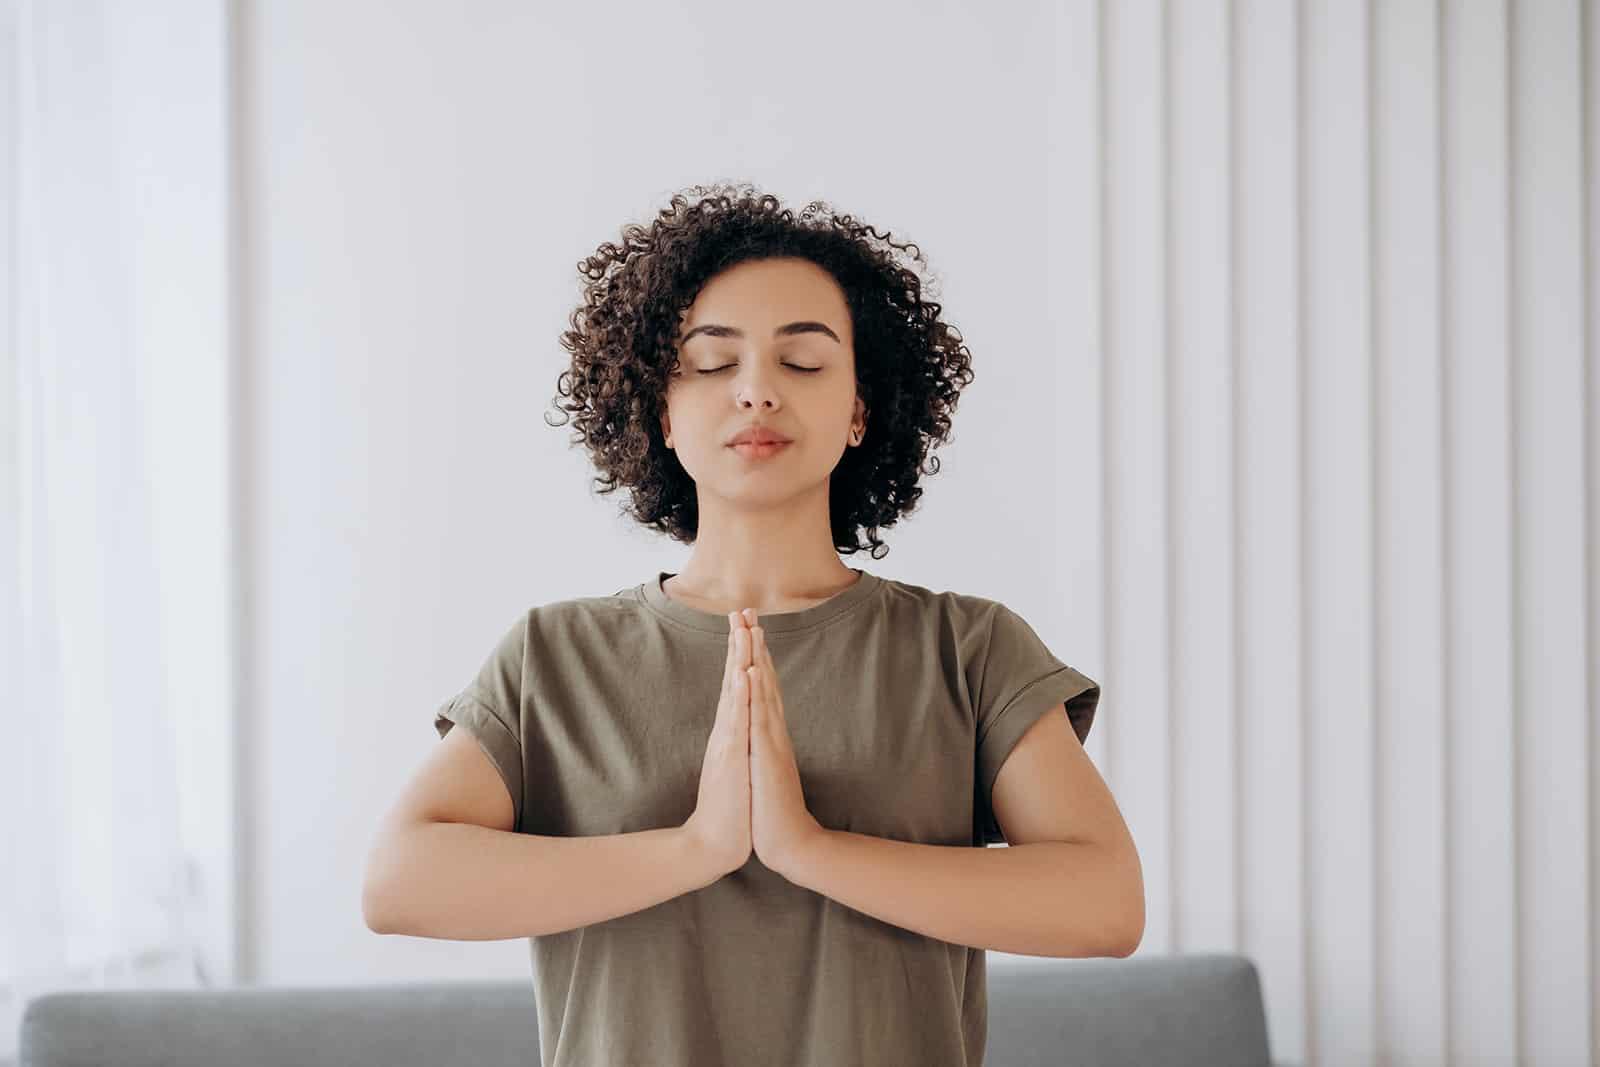 a calm woman meditating at home